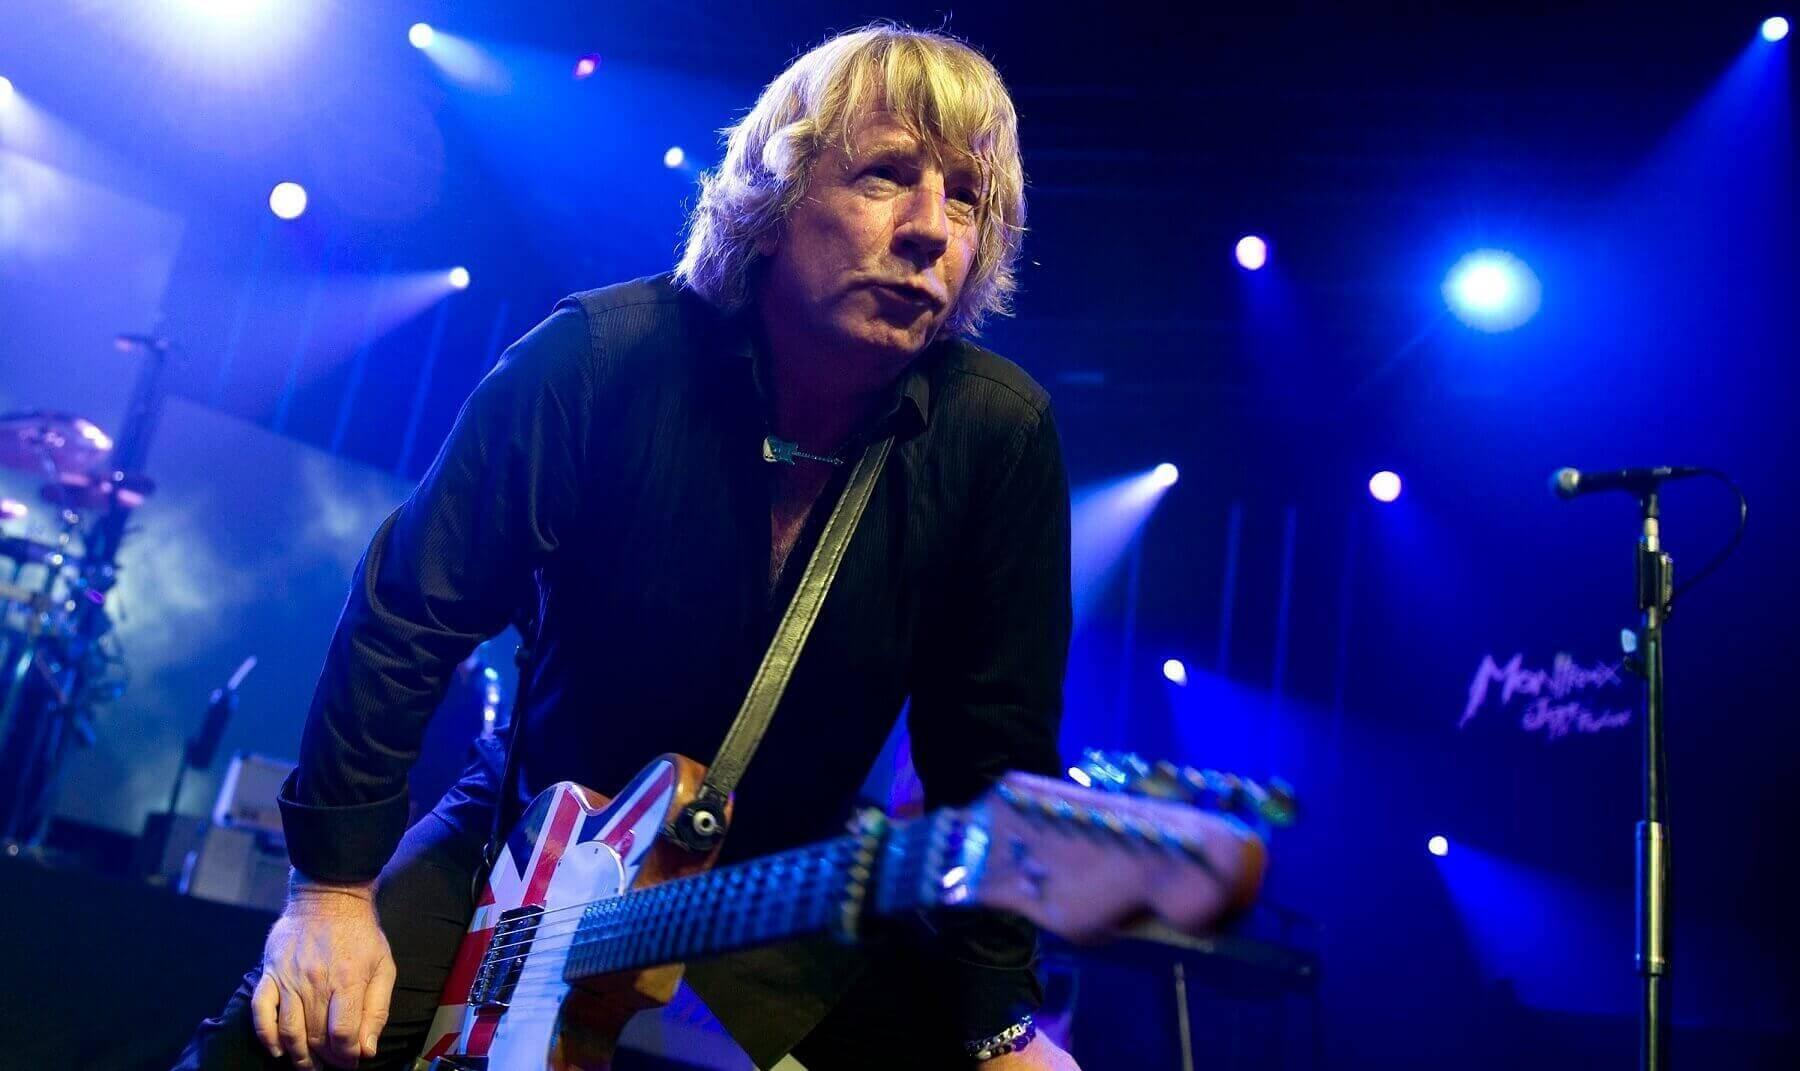 One year without Status Quo's legendary guitarist Rick Parfitt